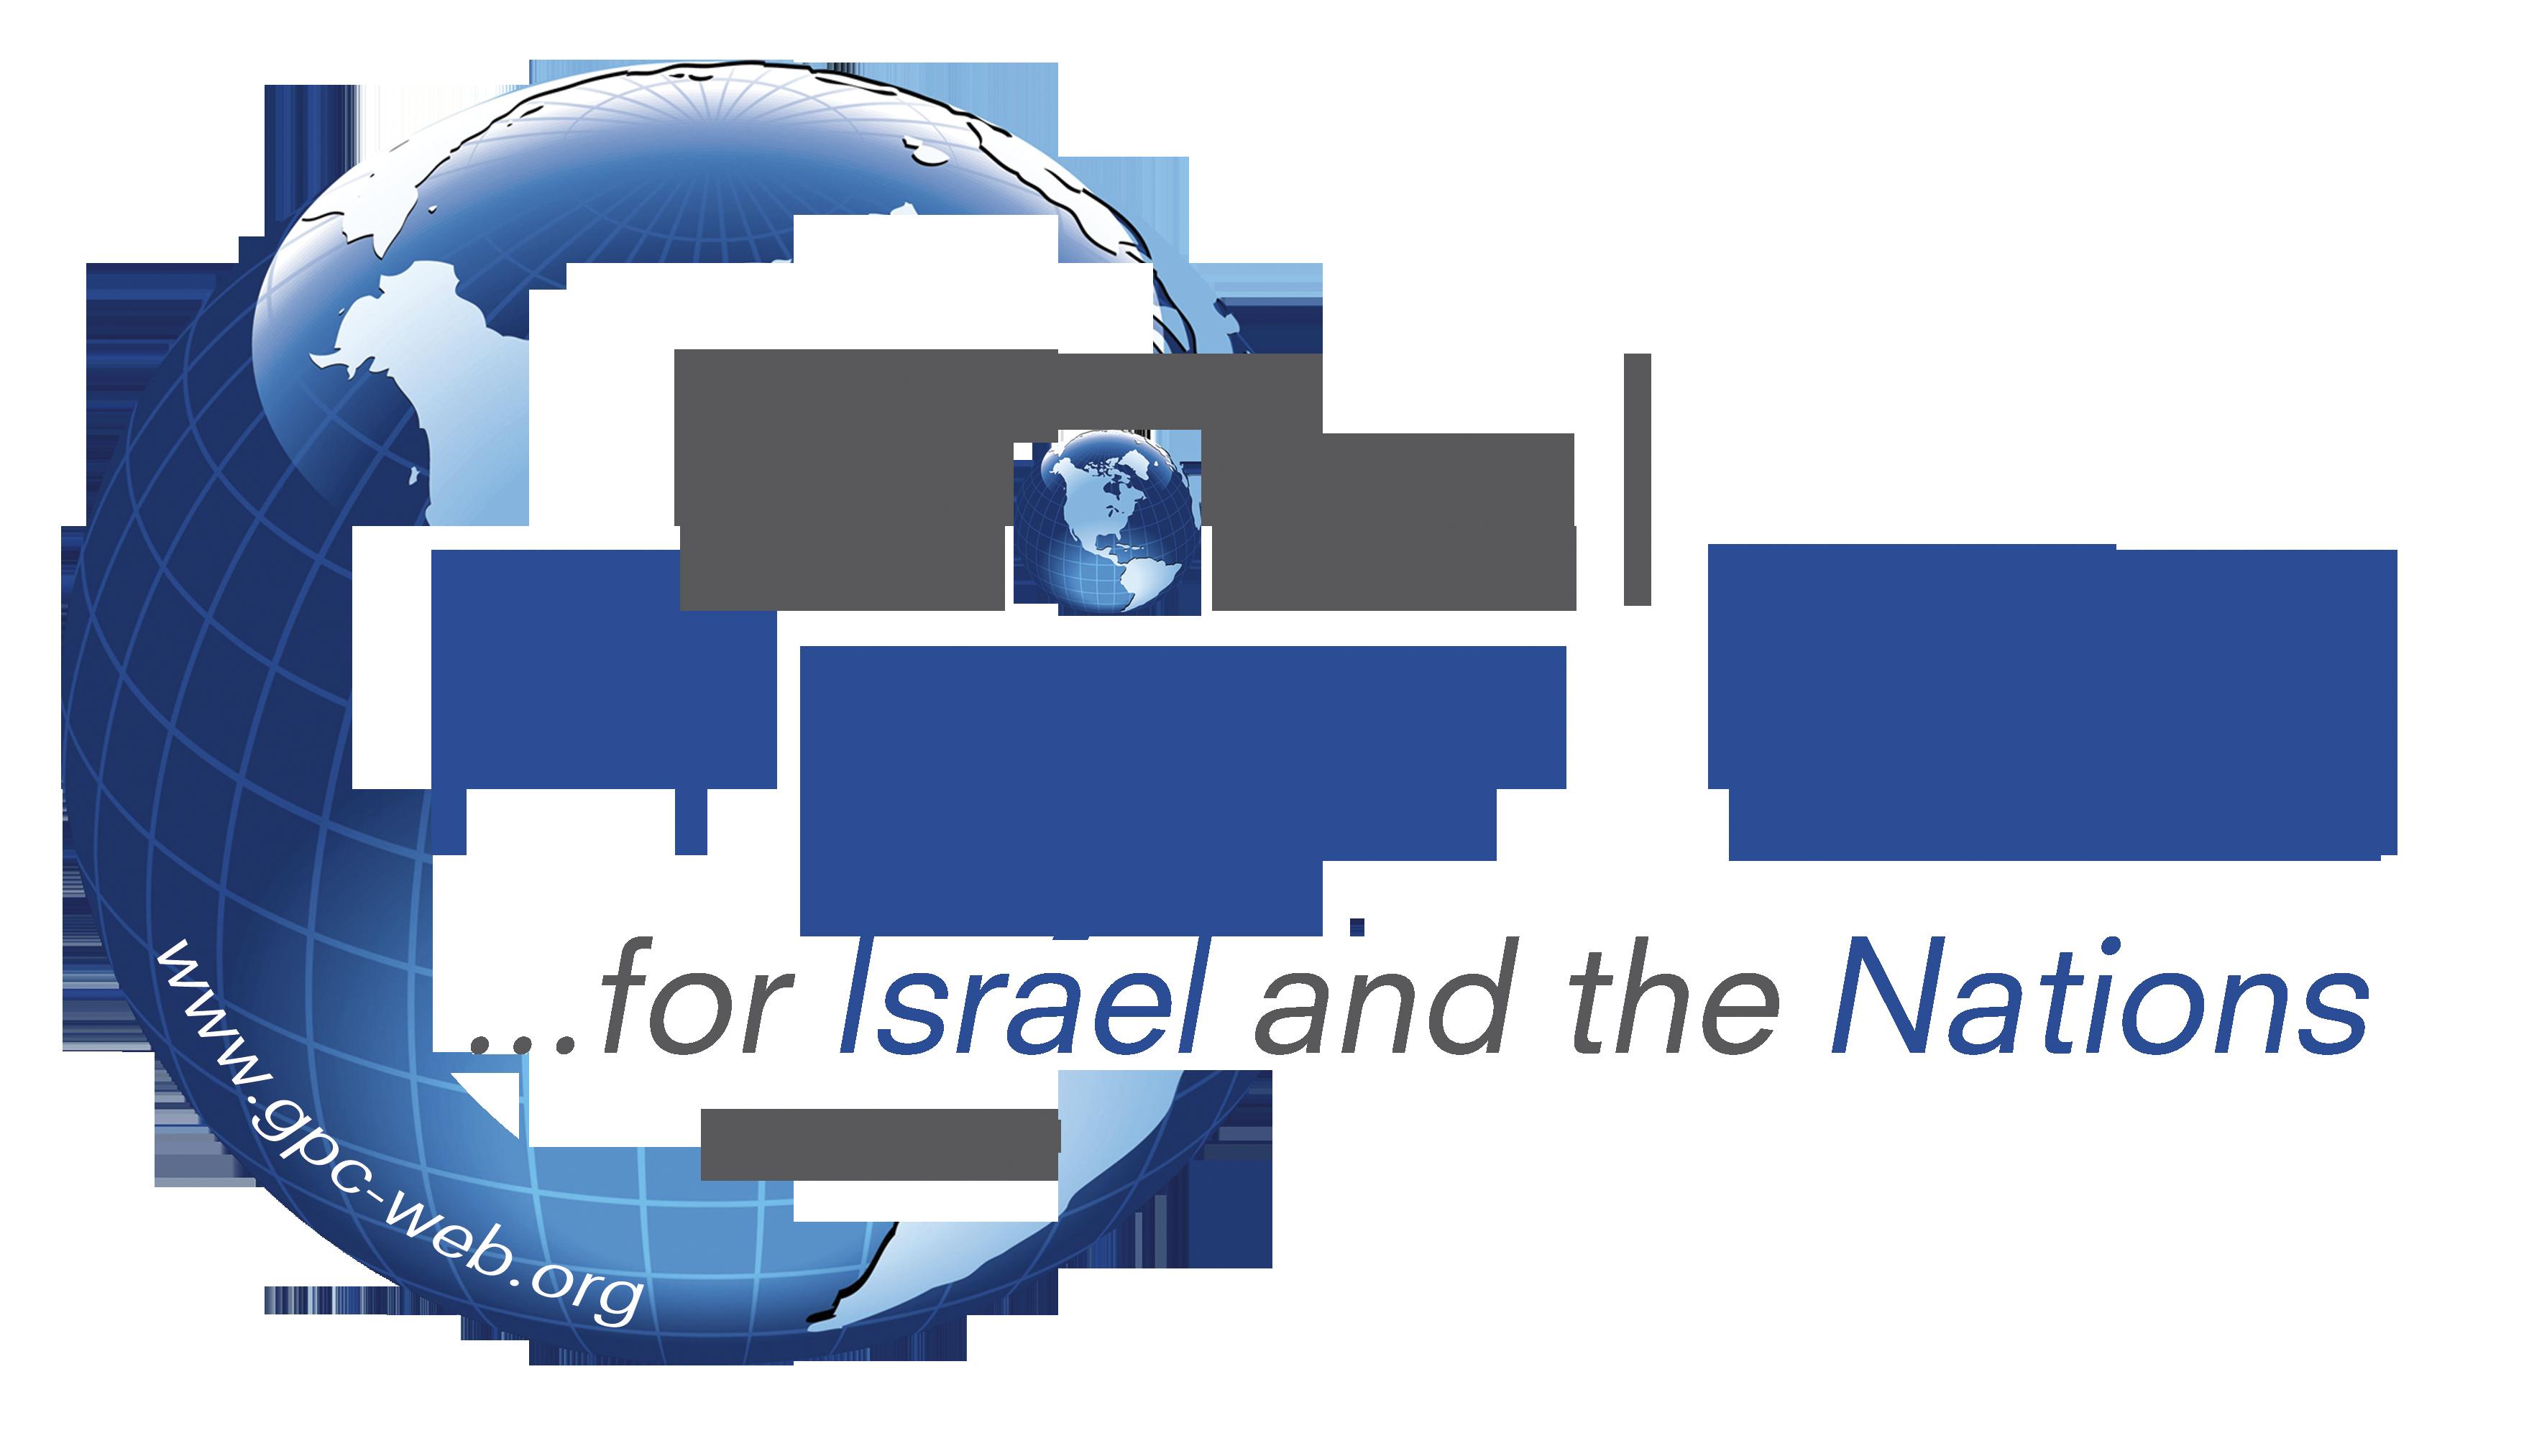 June 7-9, 2019: GPC Prayer Conference in Jerusalem